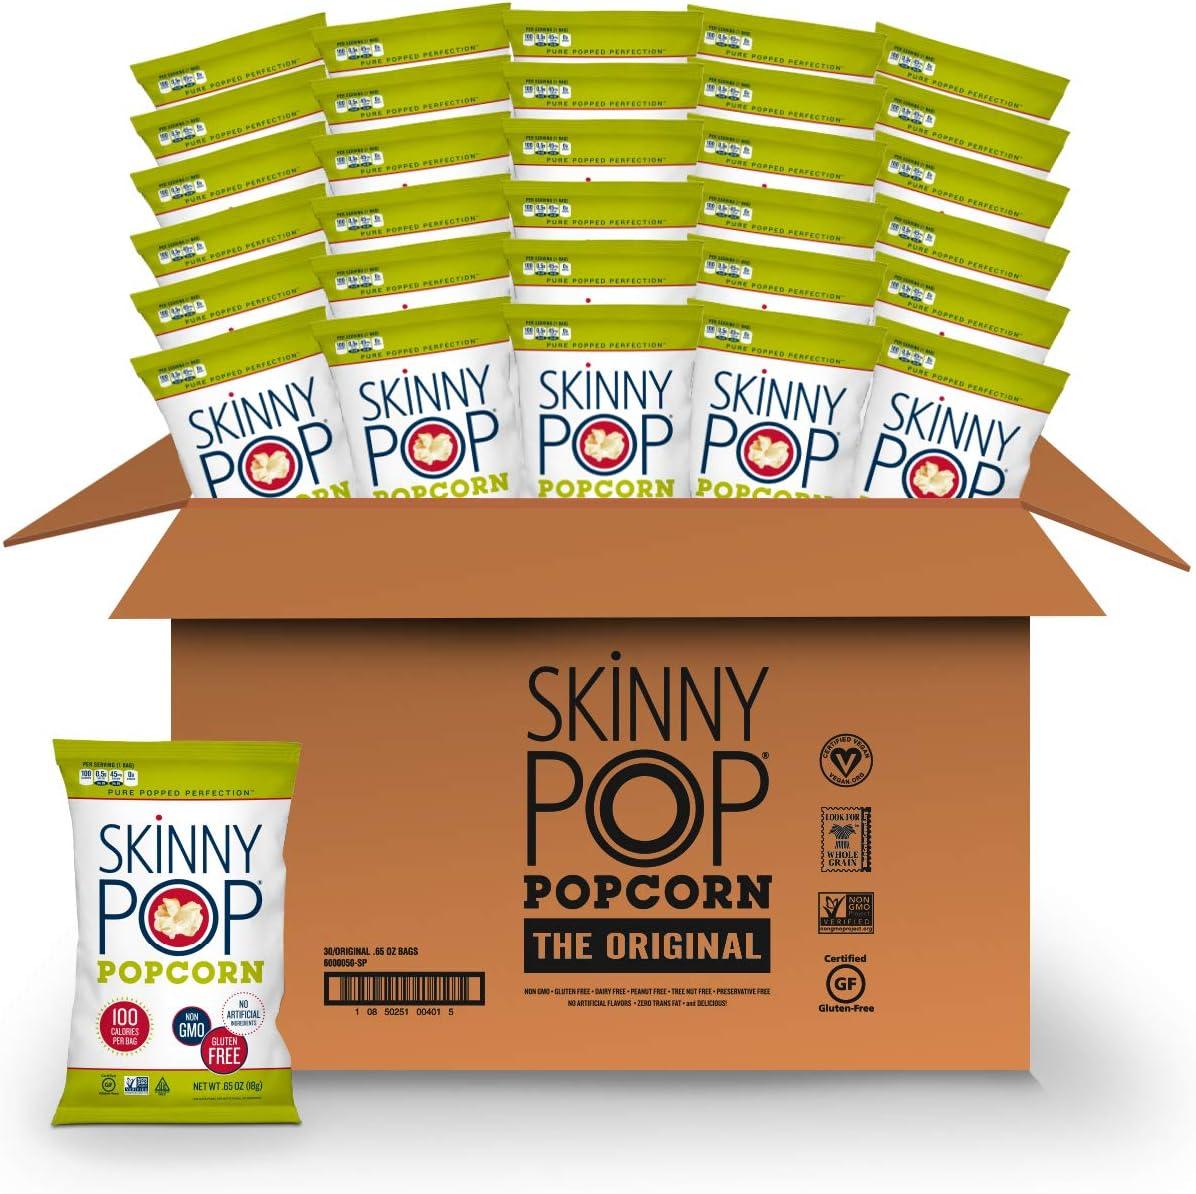 SkinnyPop Orginal Popcorn, 30ct, 0.65oz Individual Snack Size Bags, Skinny Pop, Healthy Popcorn Snacks, Gluten Free